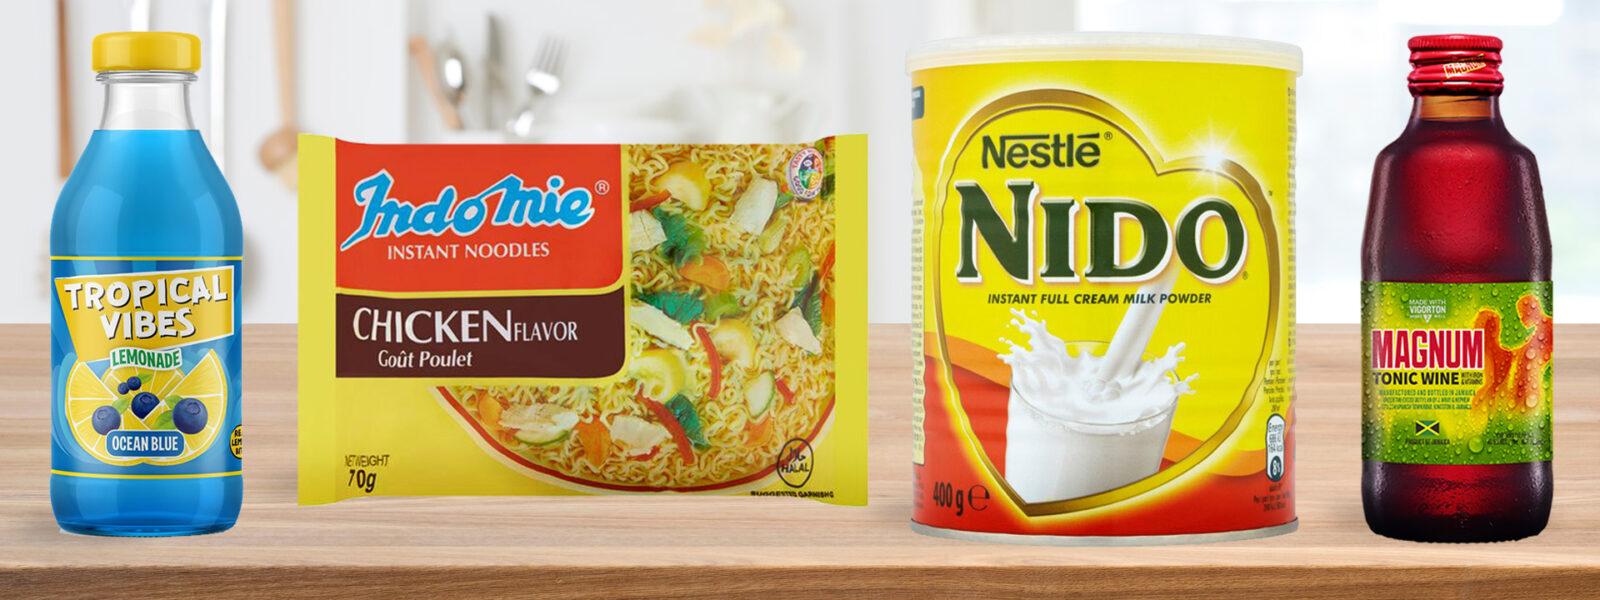 Wanis Homepage Carousel Tropical VIbes Ocean Blue Indomie Chicken Noodles Nido Milk Powder Magnum Tonic Drink Wholesale